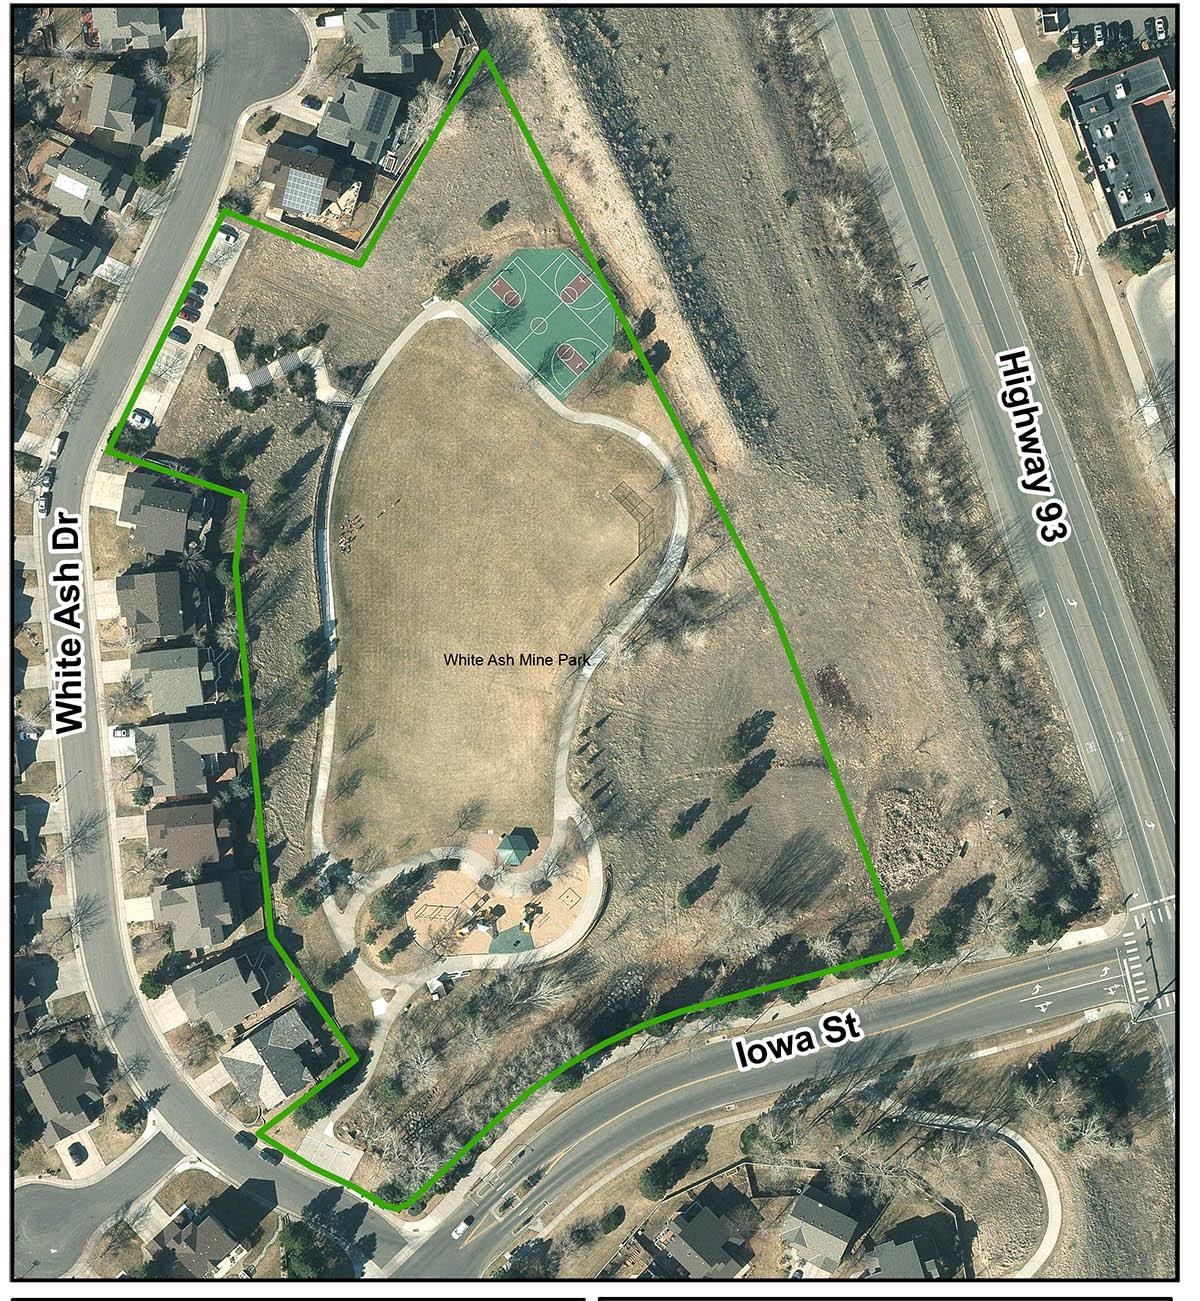 White Ash Mine Park Birds Eye View Map aerial view